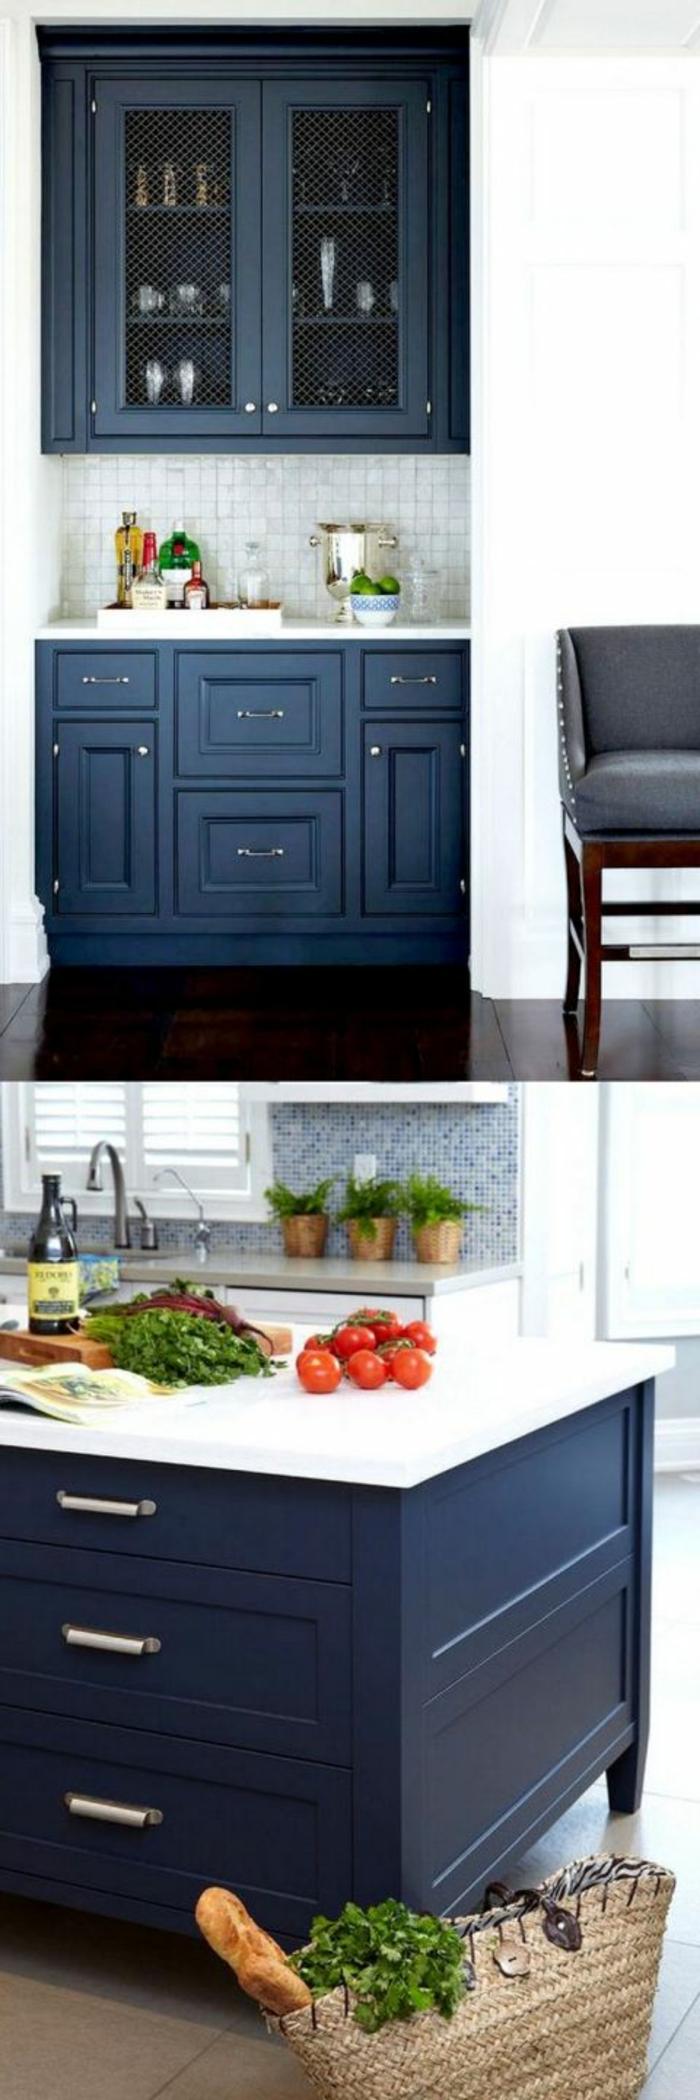 deco bleu canard, meuble bleu canard avec plan de travail en blanc, crédence en bleu et blanc, carrelage en marron clair